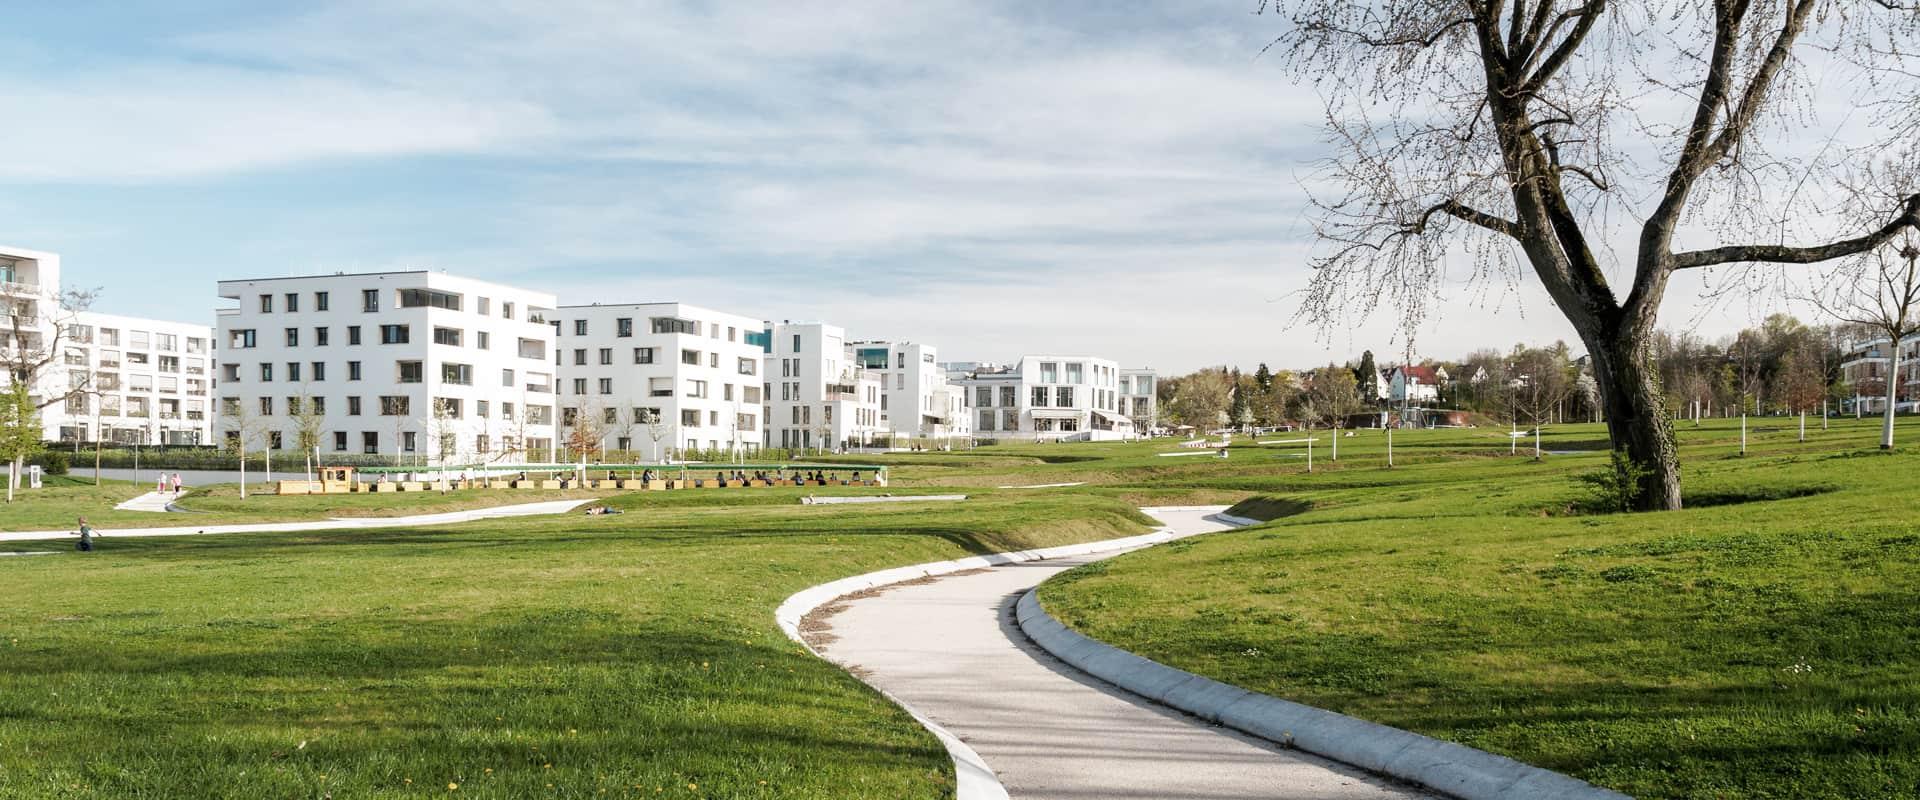 WOLFER Gutachten | Immobilienbewertung - Stuttgart, Ludwigsburg, Gerlingen